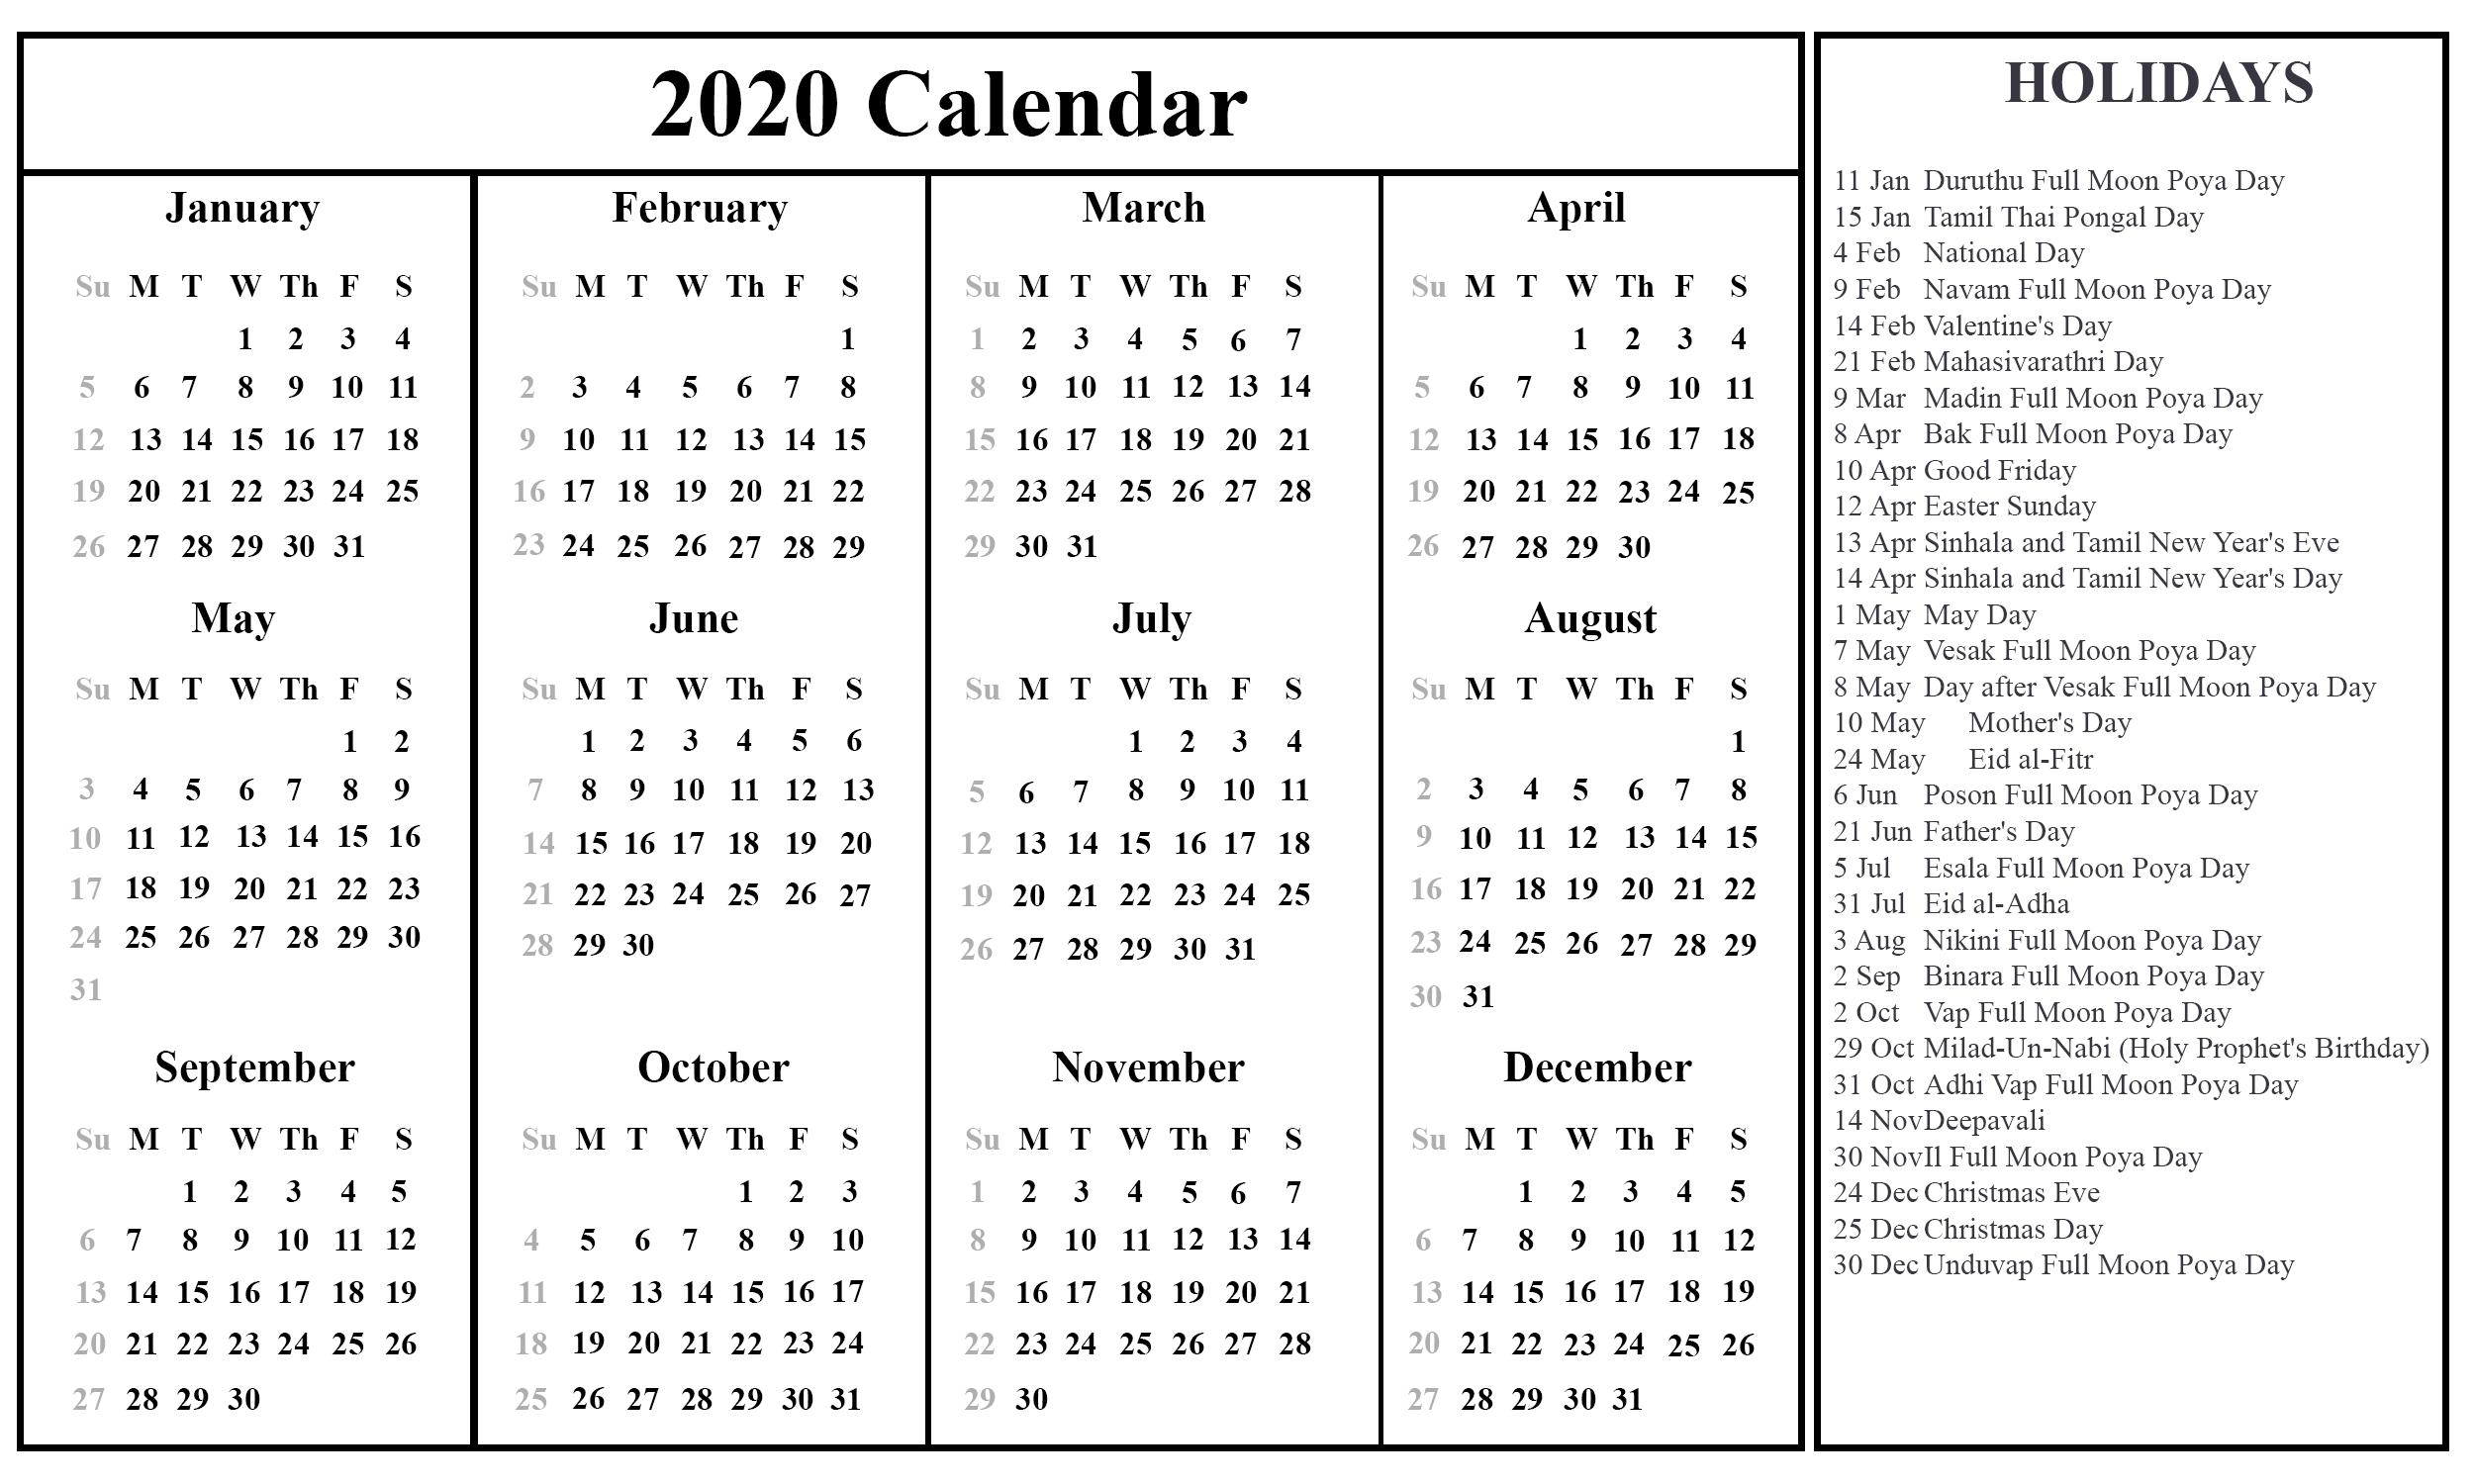 Printable December Calendar Template  Calendar 2020 August-December